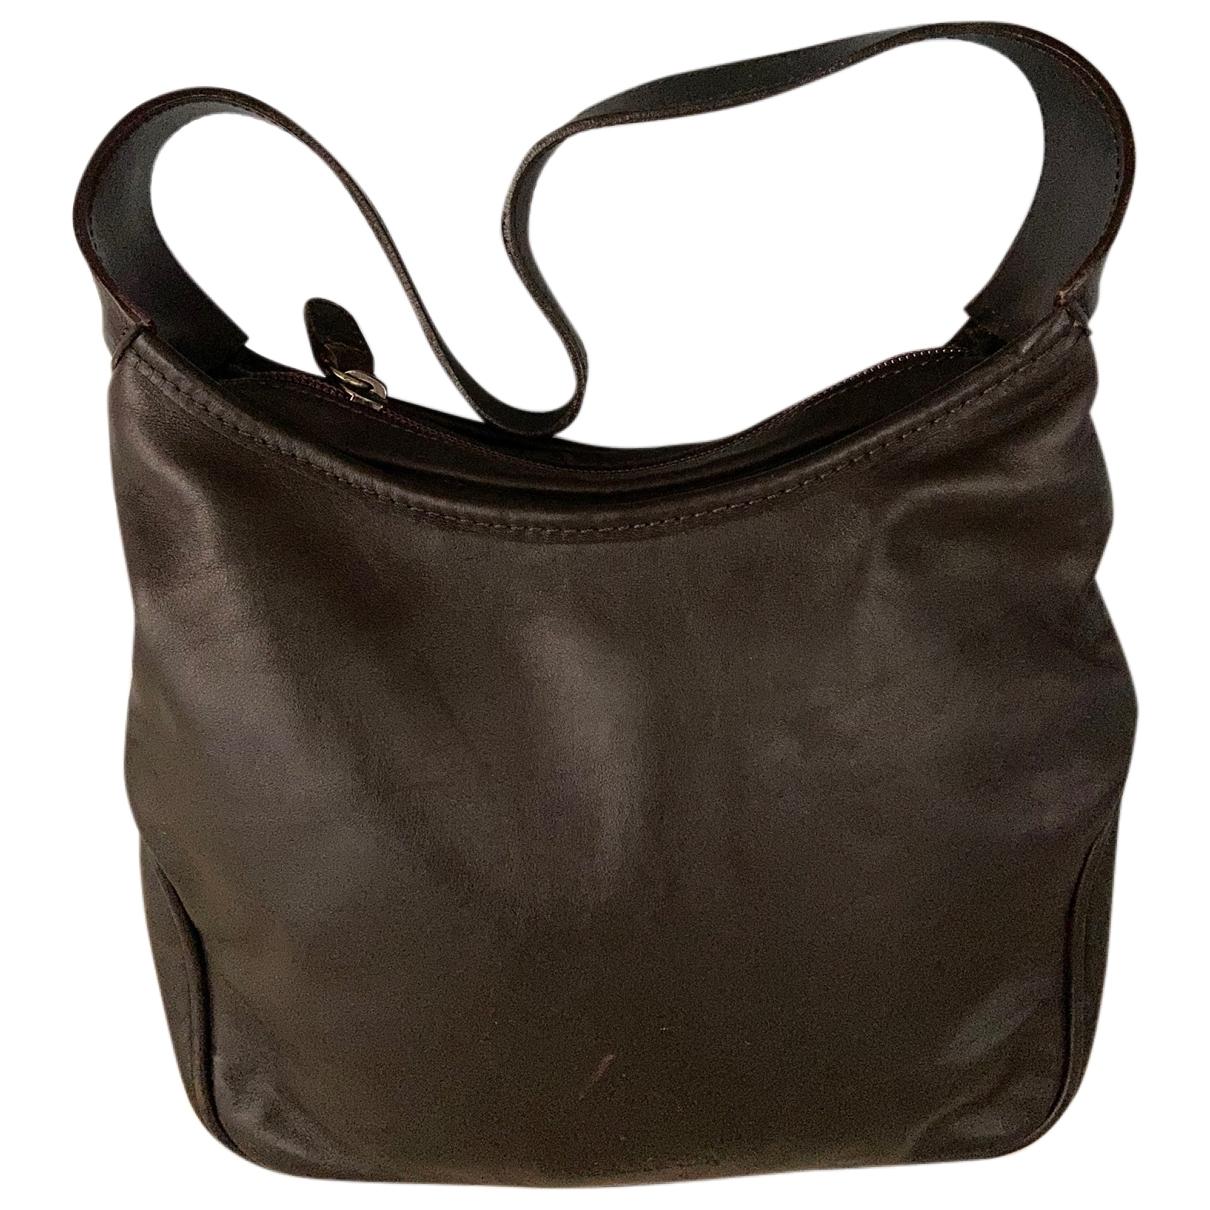 Max & Co \N Brown Leather handbag for Women \N